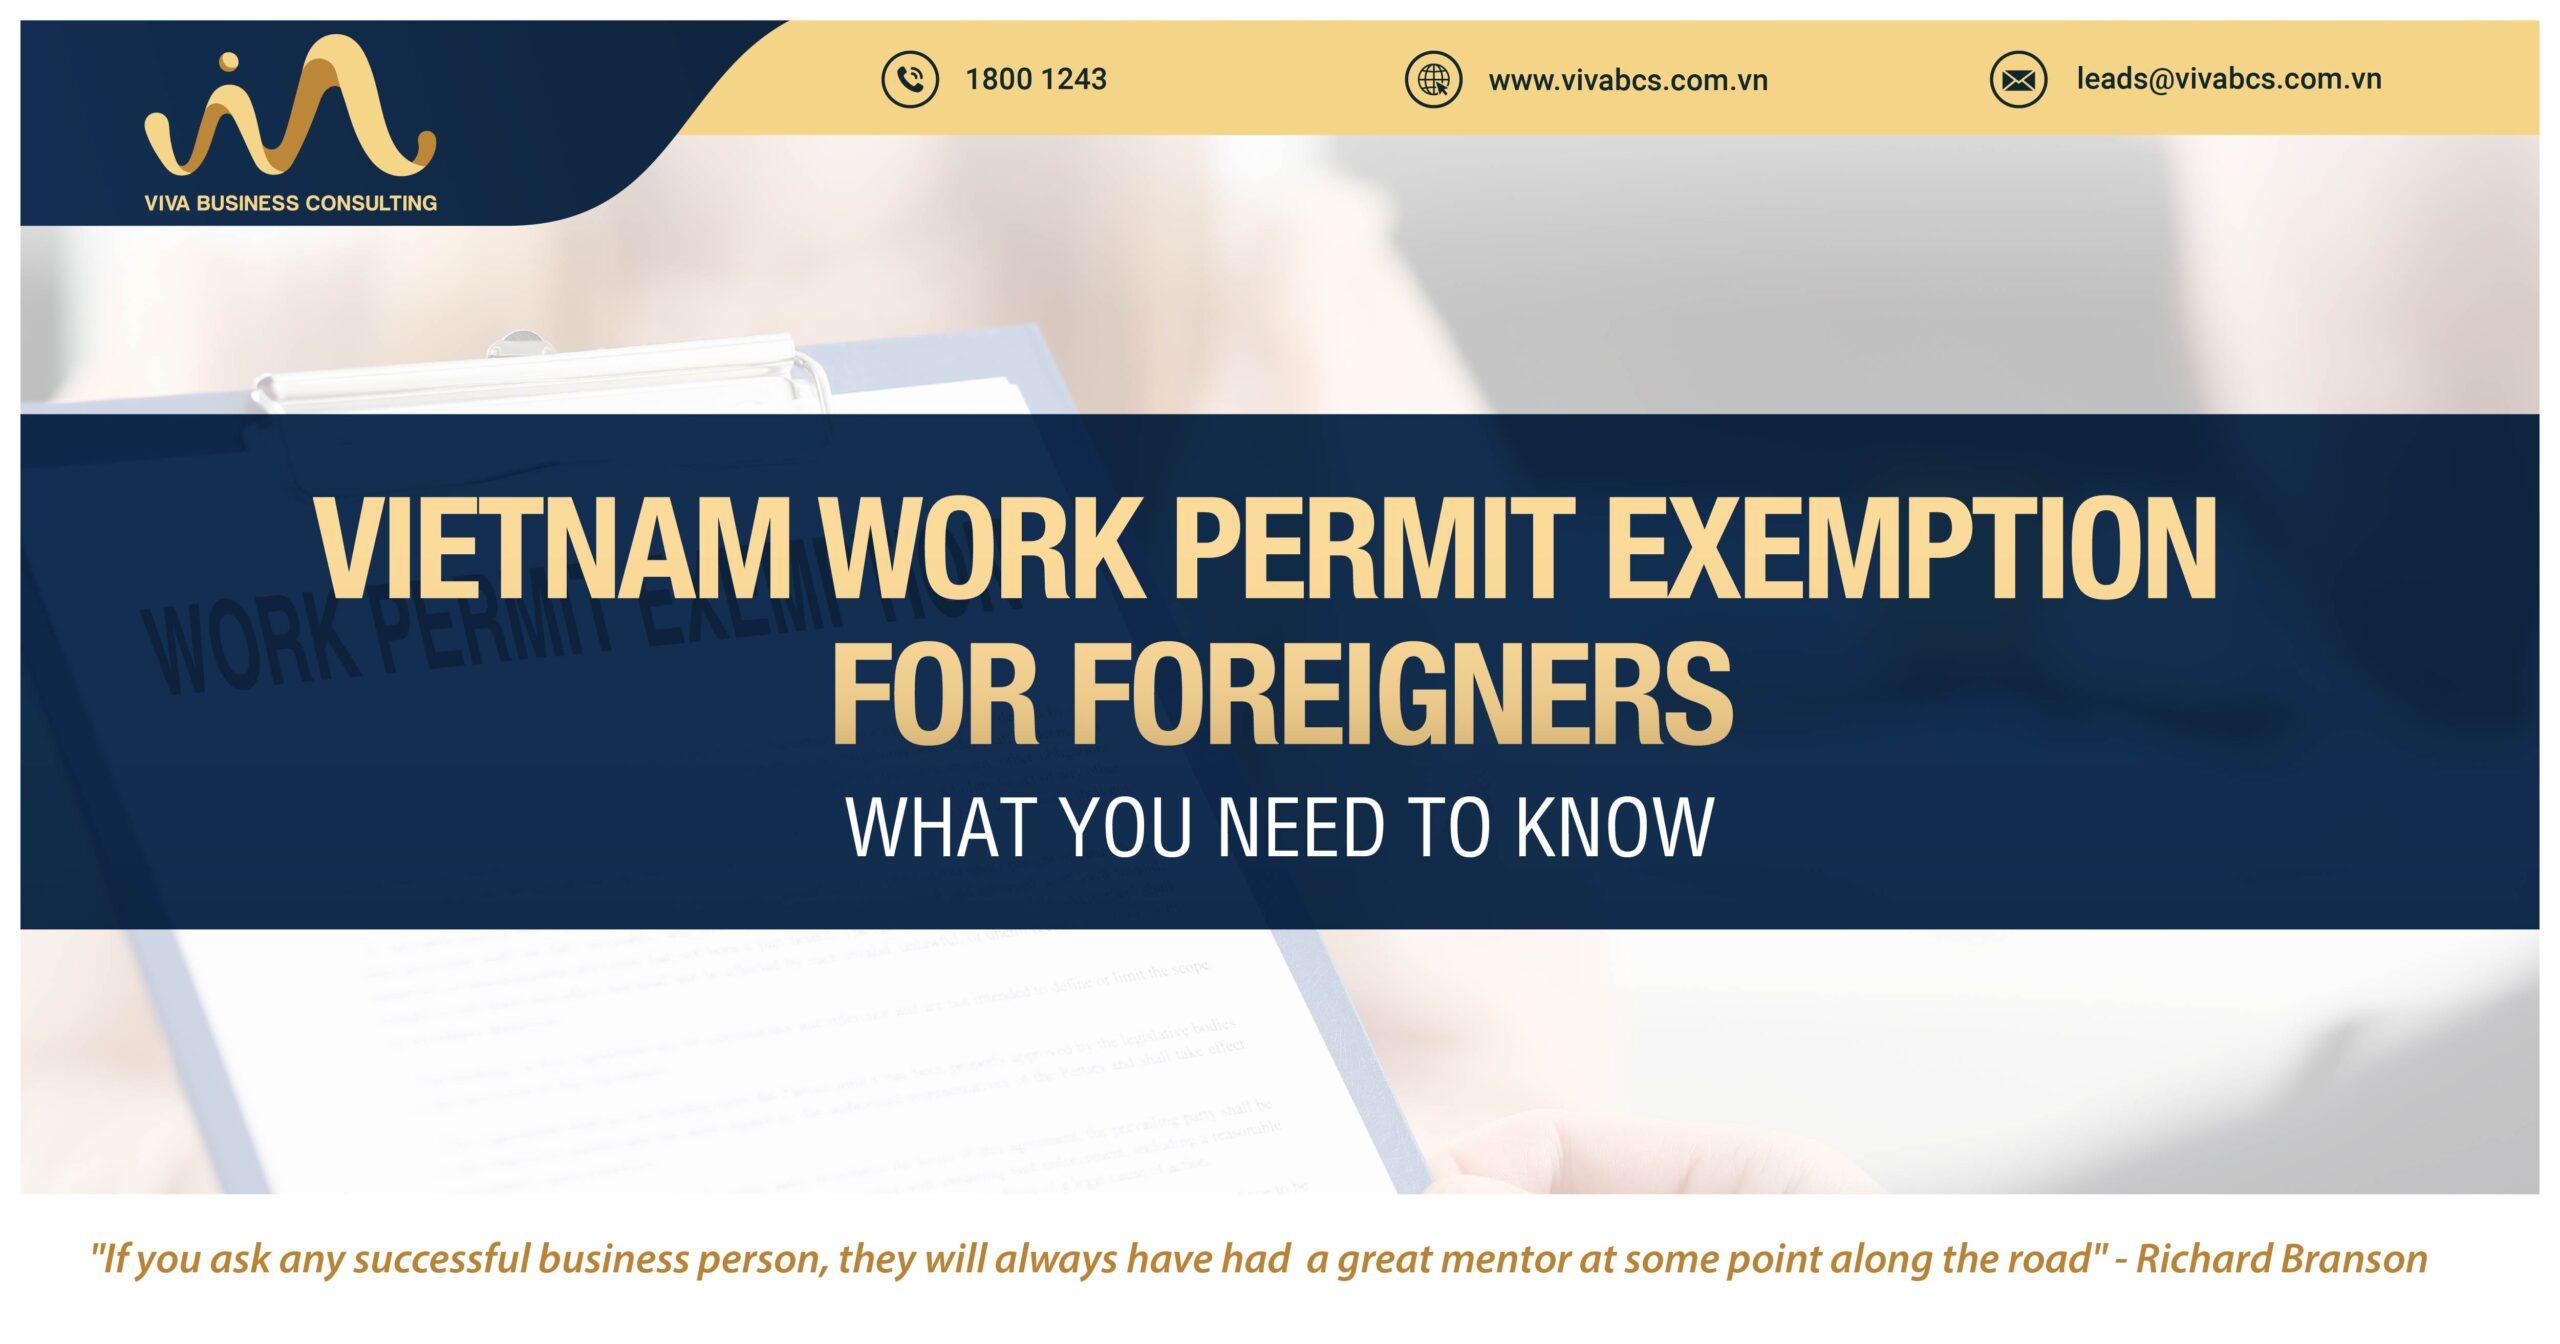 Expats in Vietnam: work permit exemption